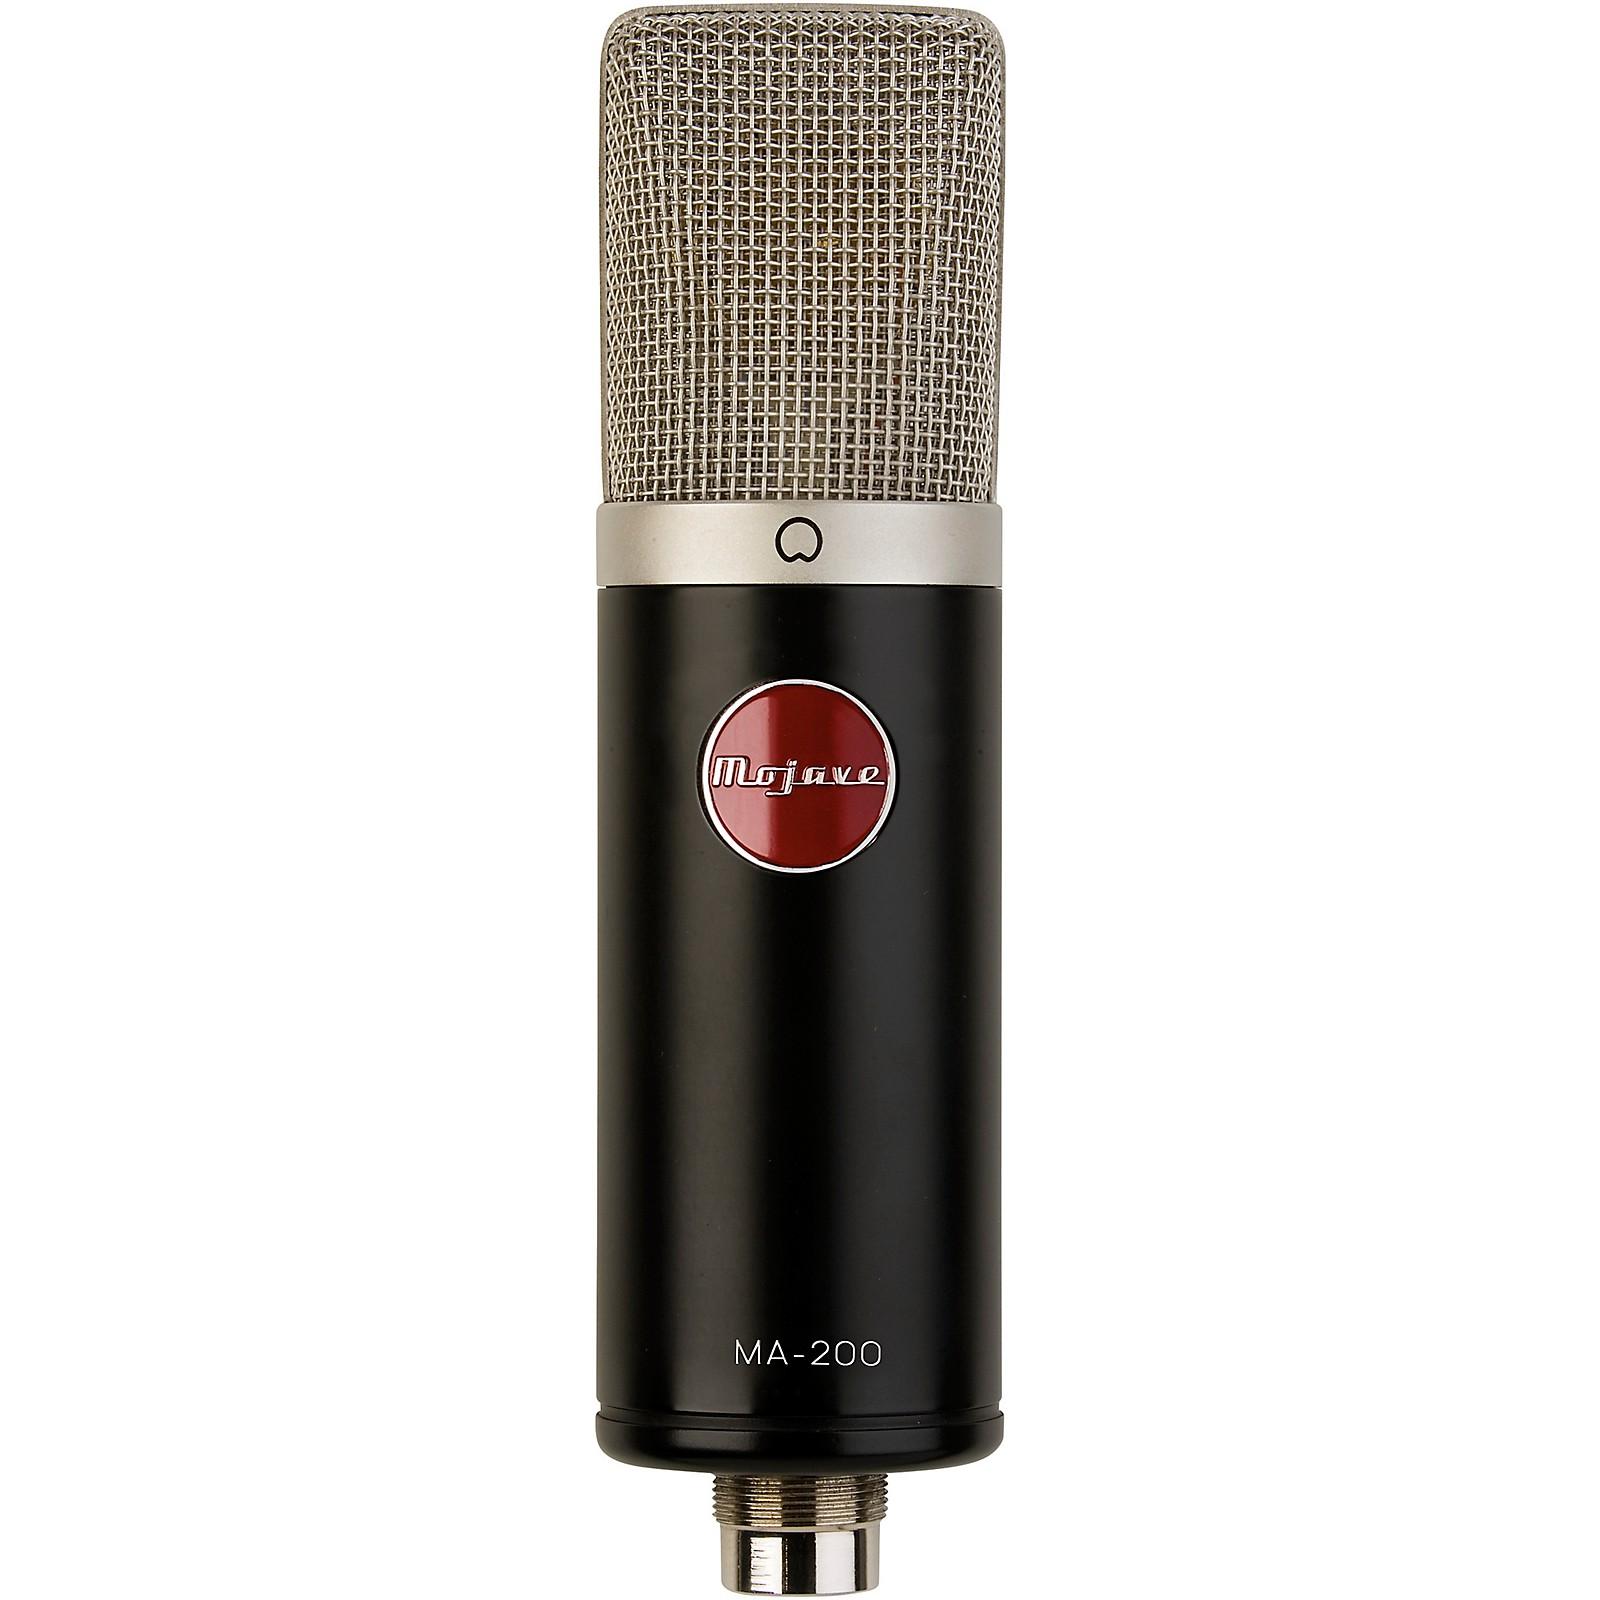 Mojave Audio MA-200 Large Diaphragm Tube Condenser Microphone